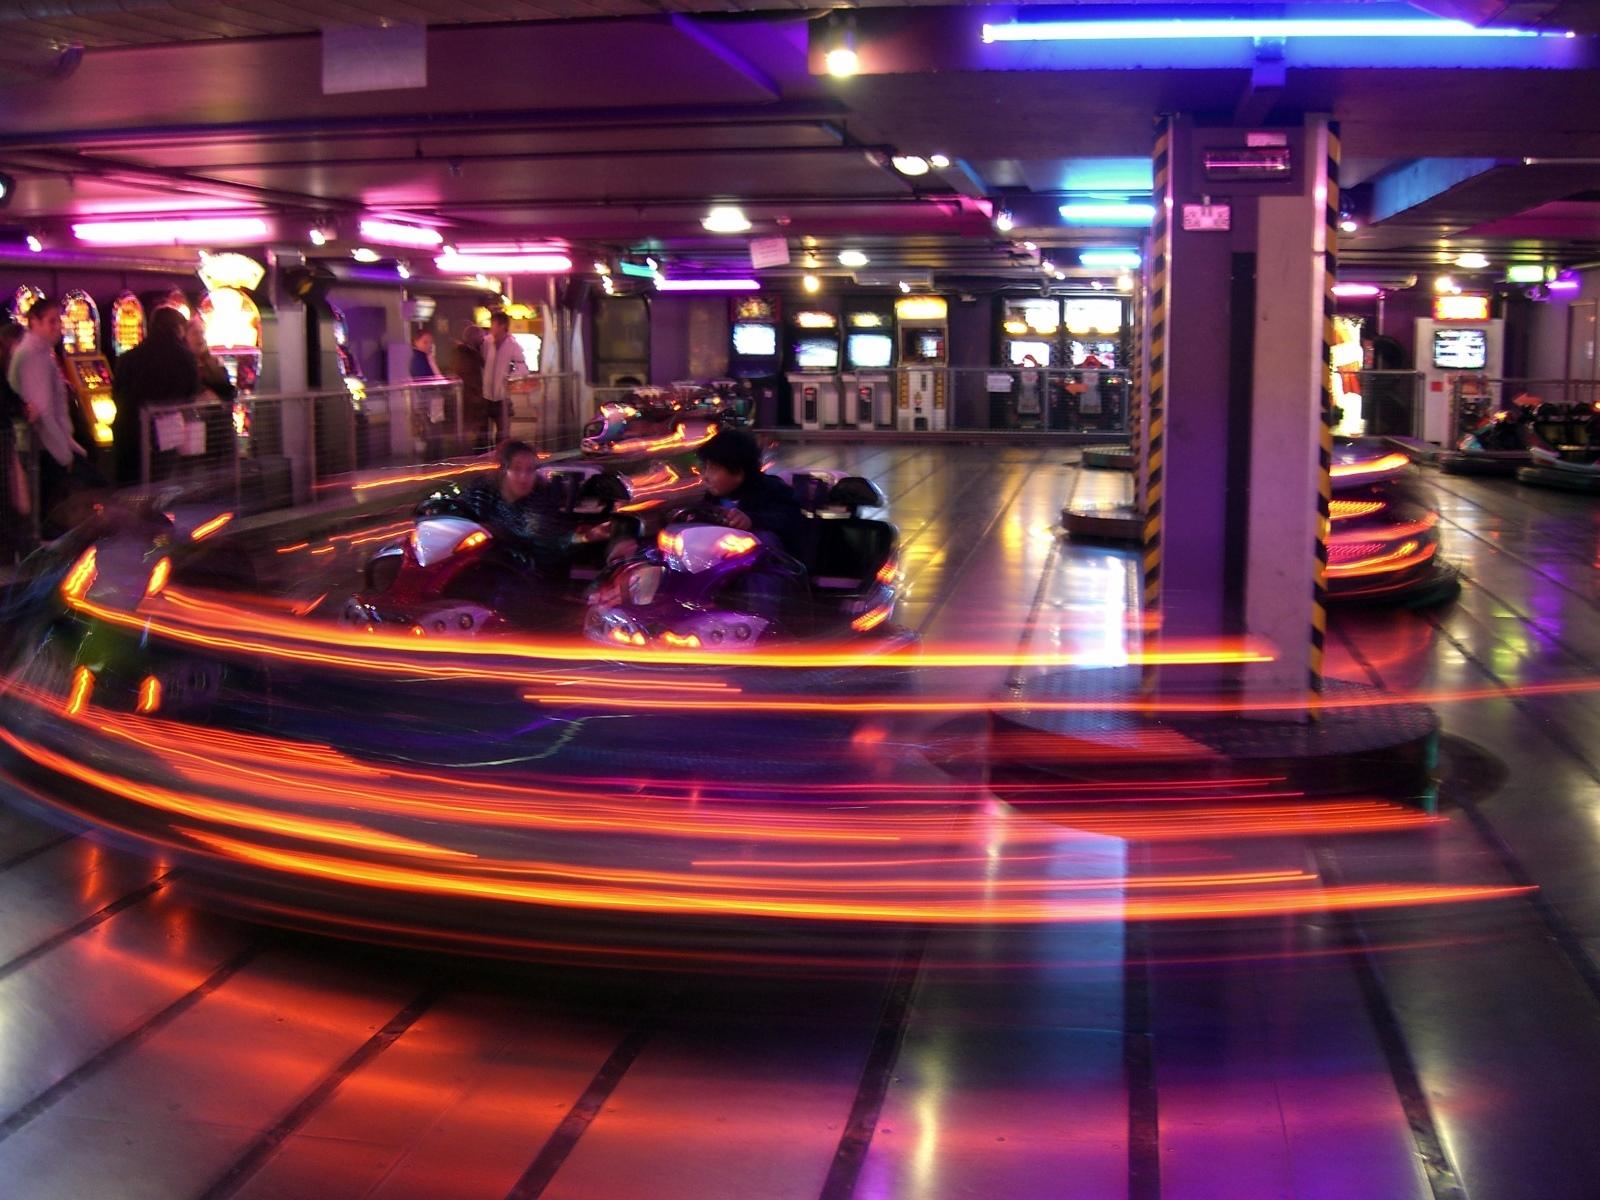 Bumper Car Images >> File:London Trocadero bumper cars.jpg - Wikimedia Commons